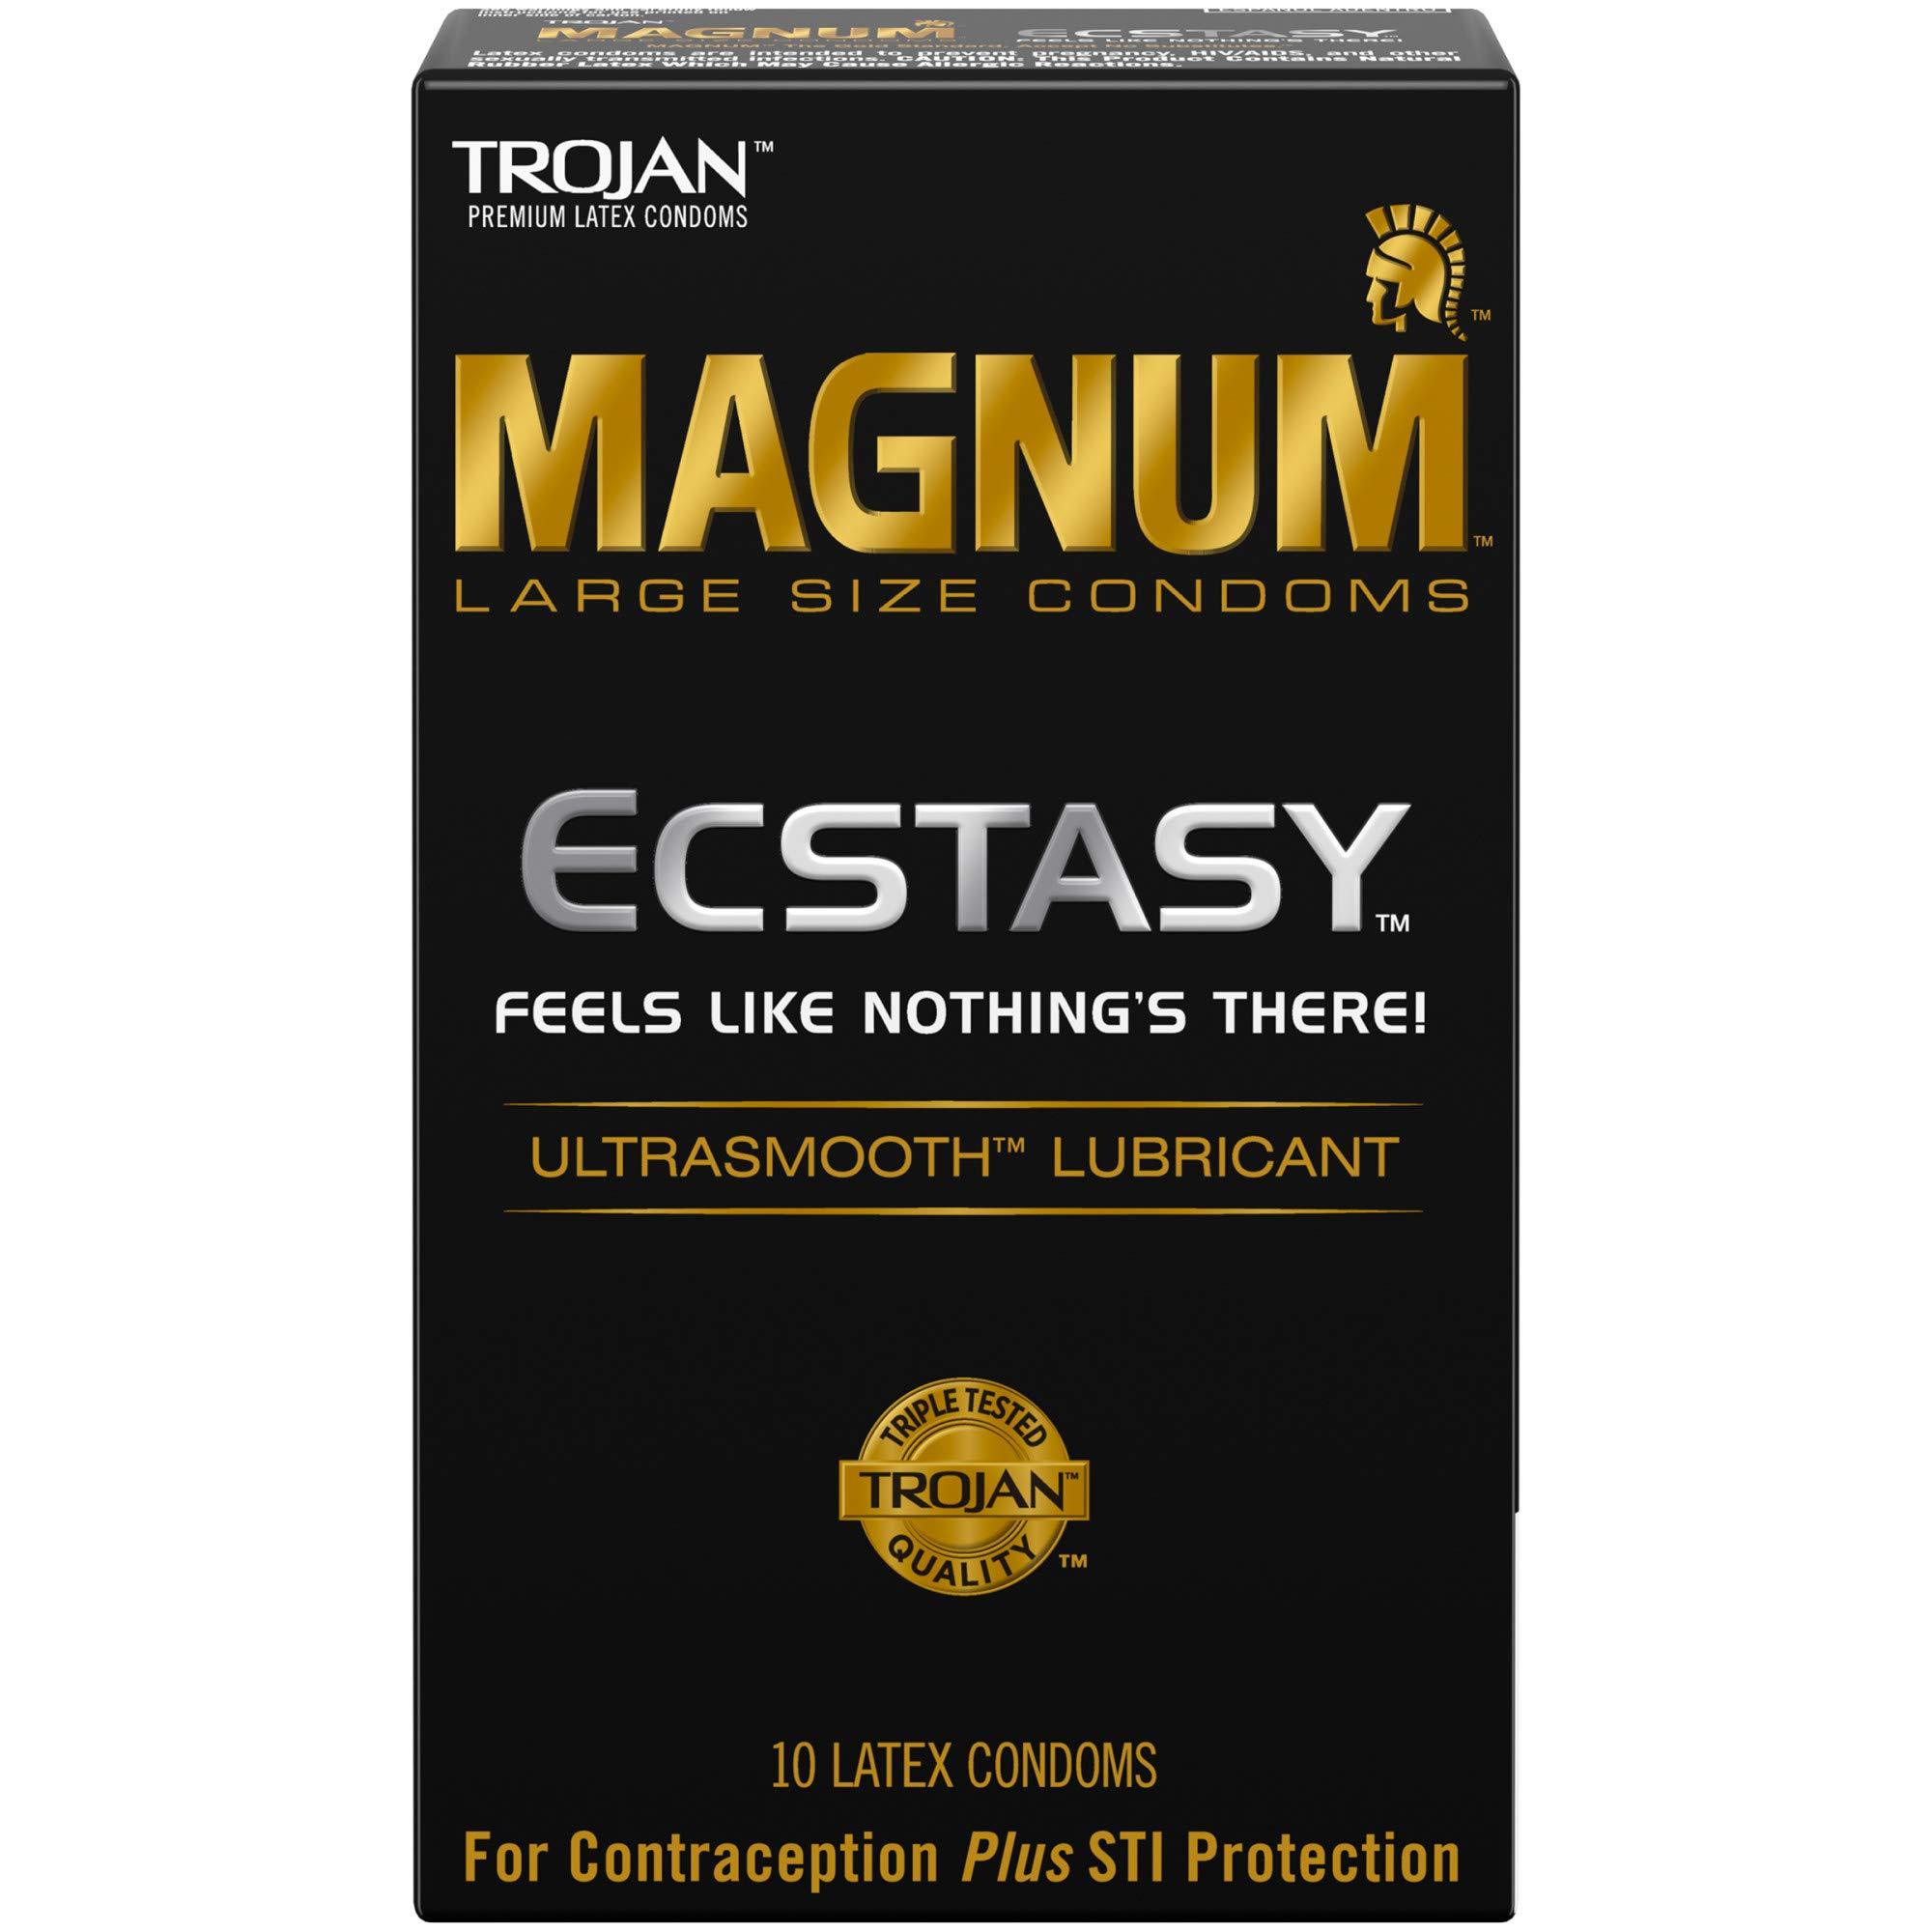 Trojan Magnum Ecstasy Ultrasmooth Lubricant